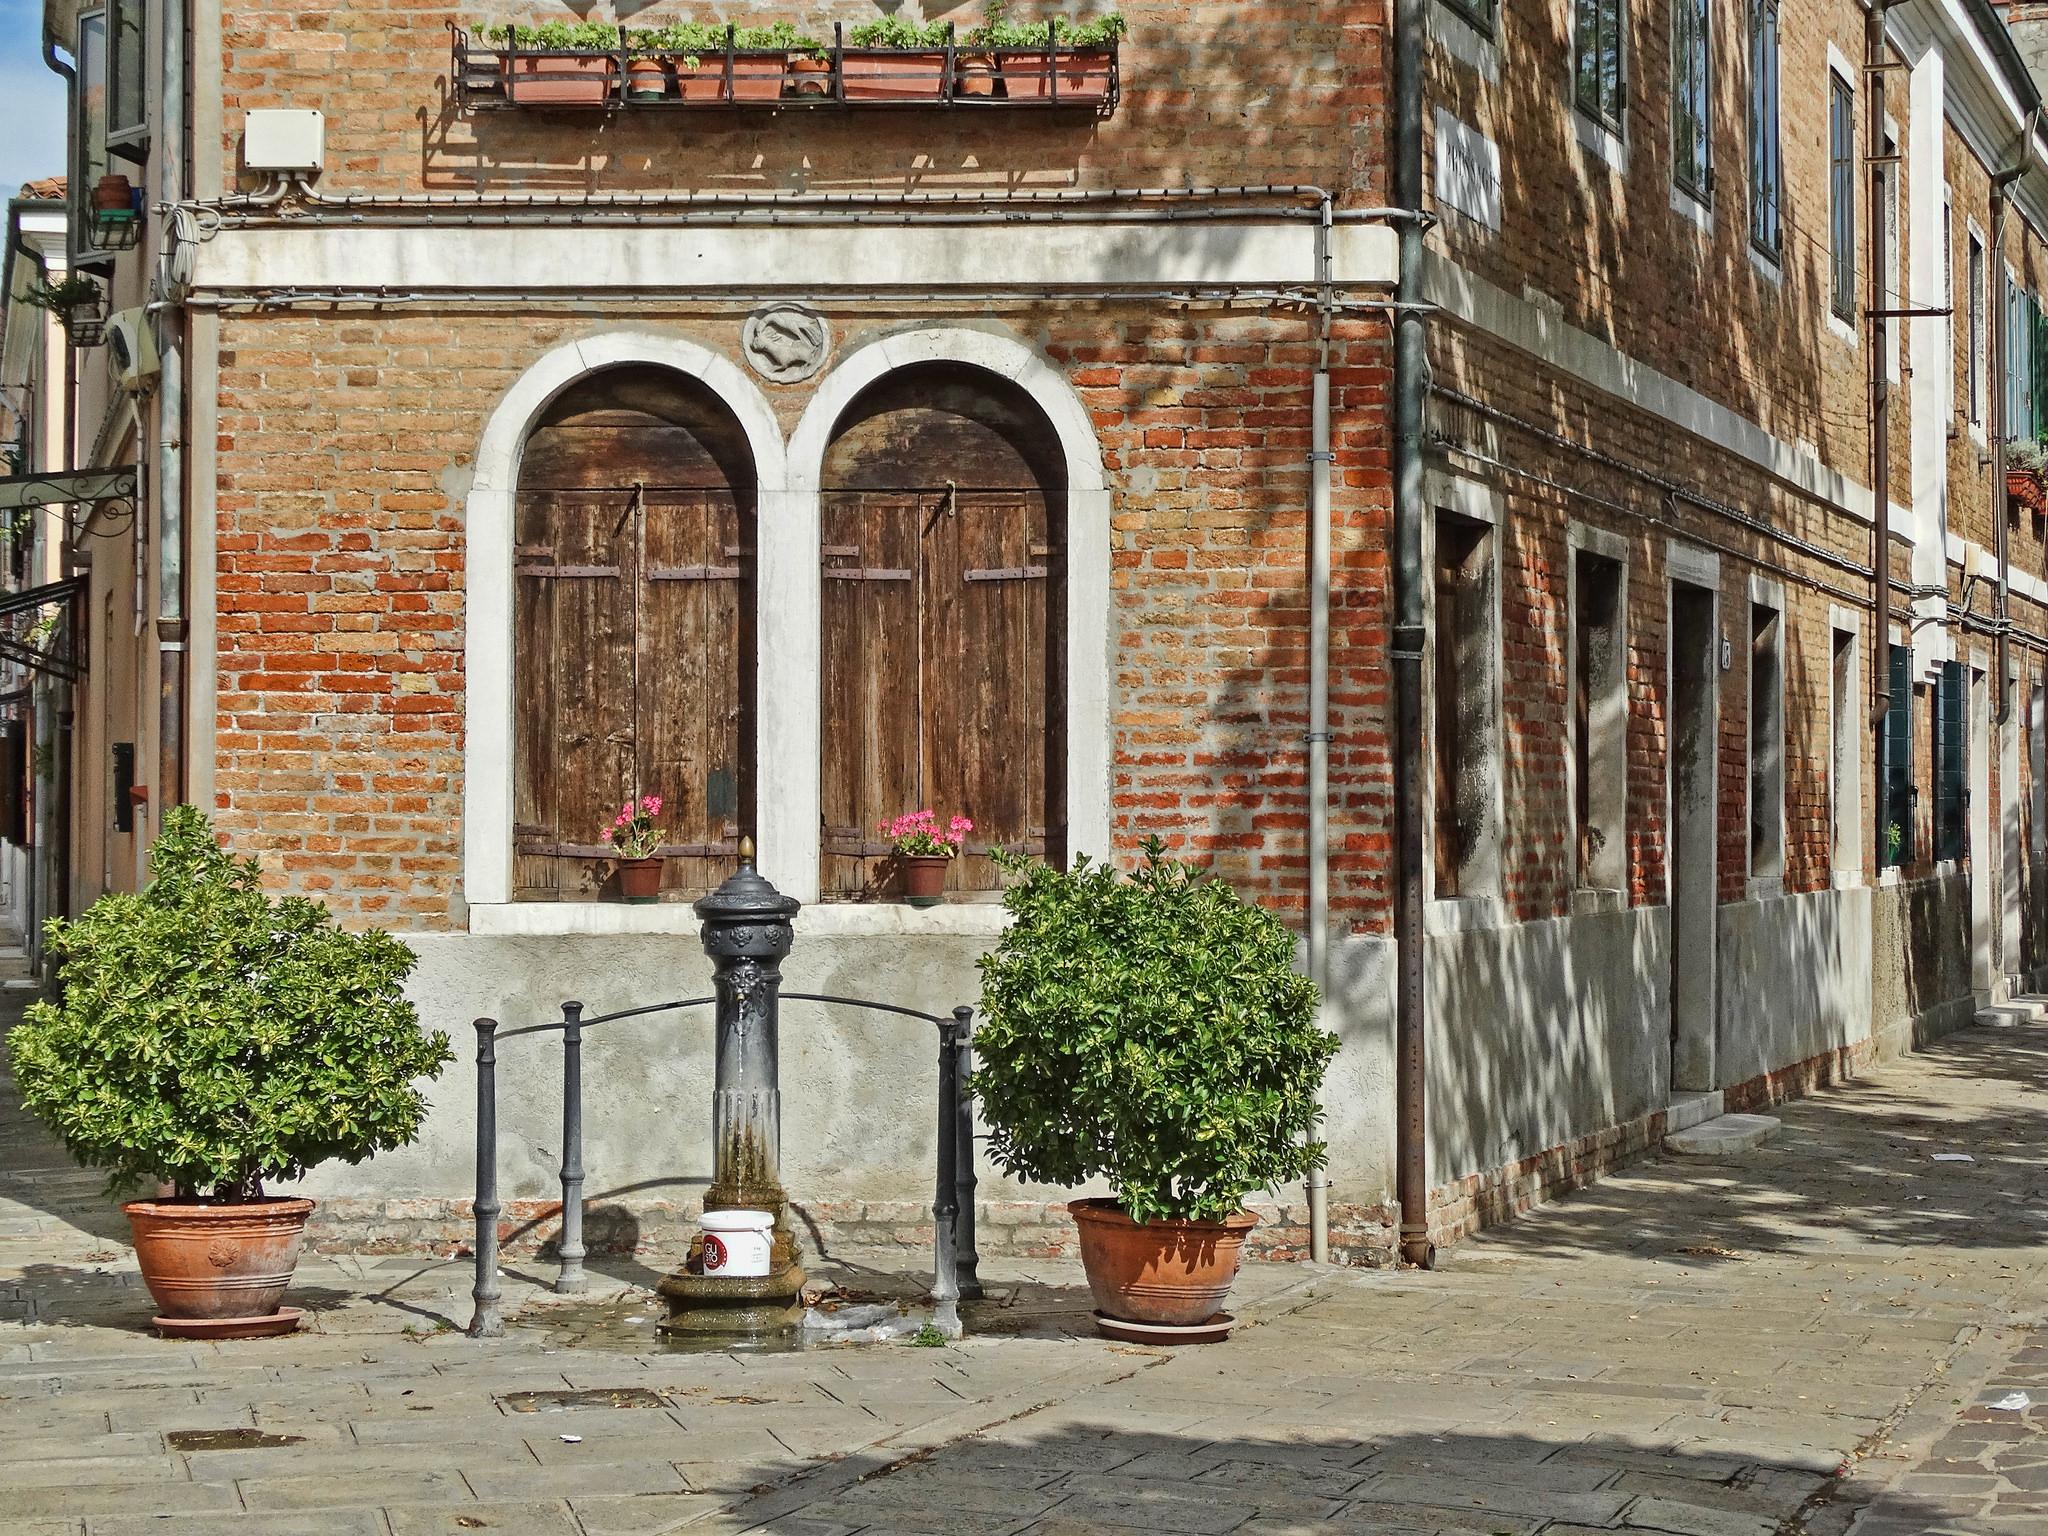 Фонтан в Мурано, Венеция